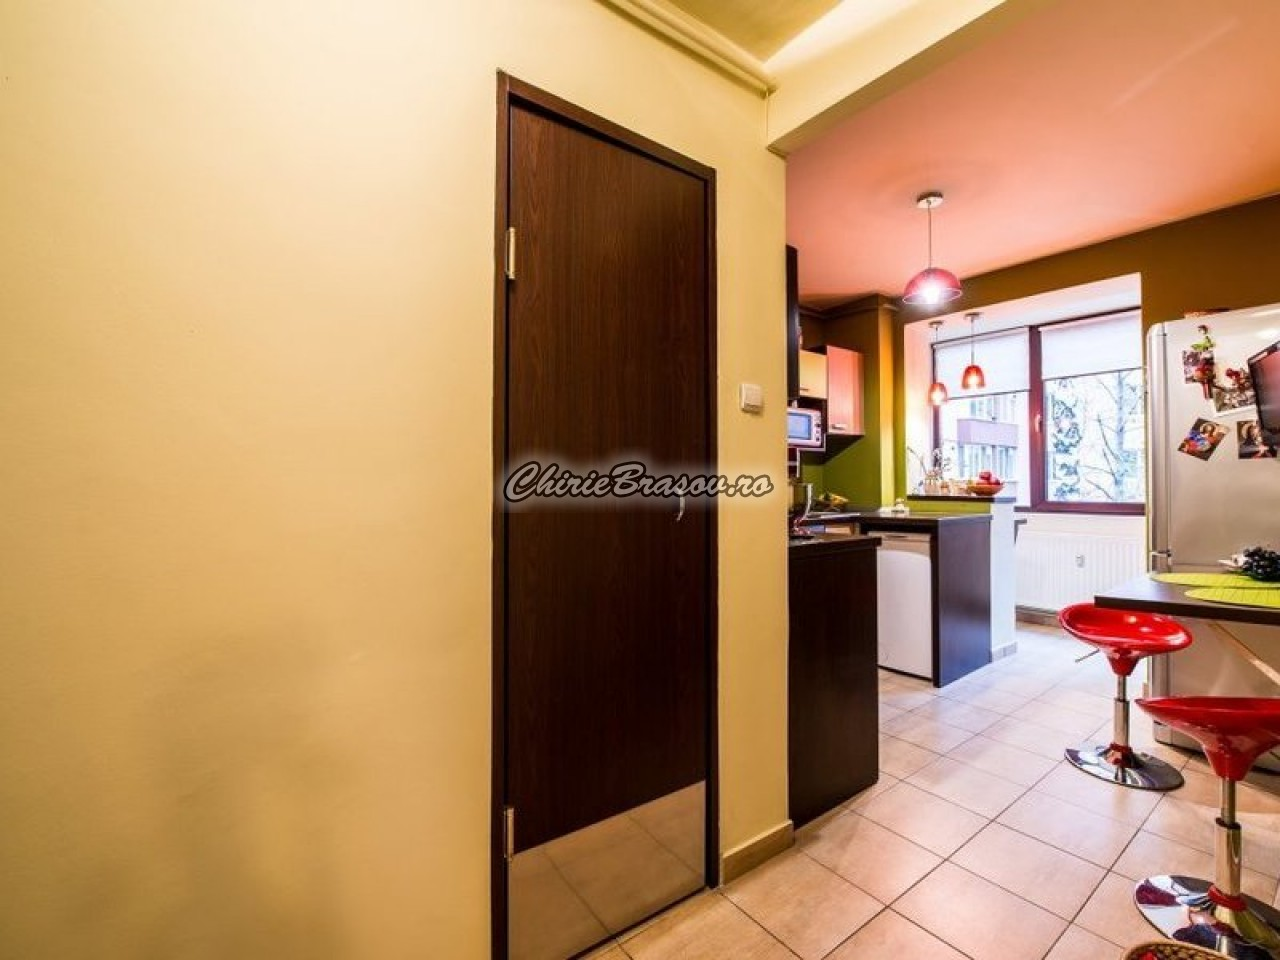 Inchiriere apartament 2 camere Brasov , Central - Grivitei-353-9